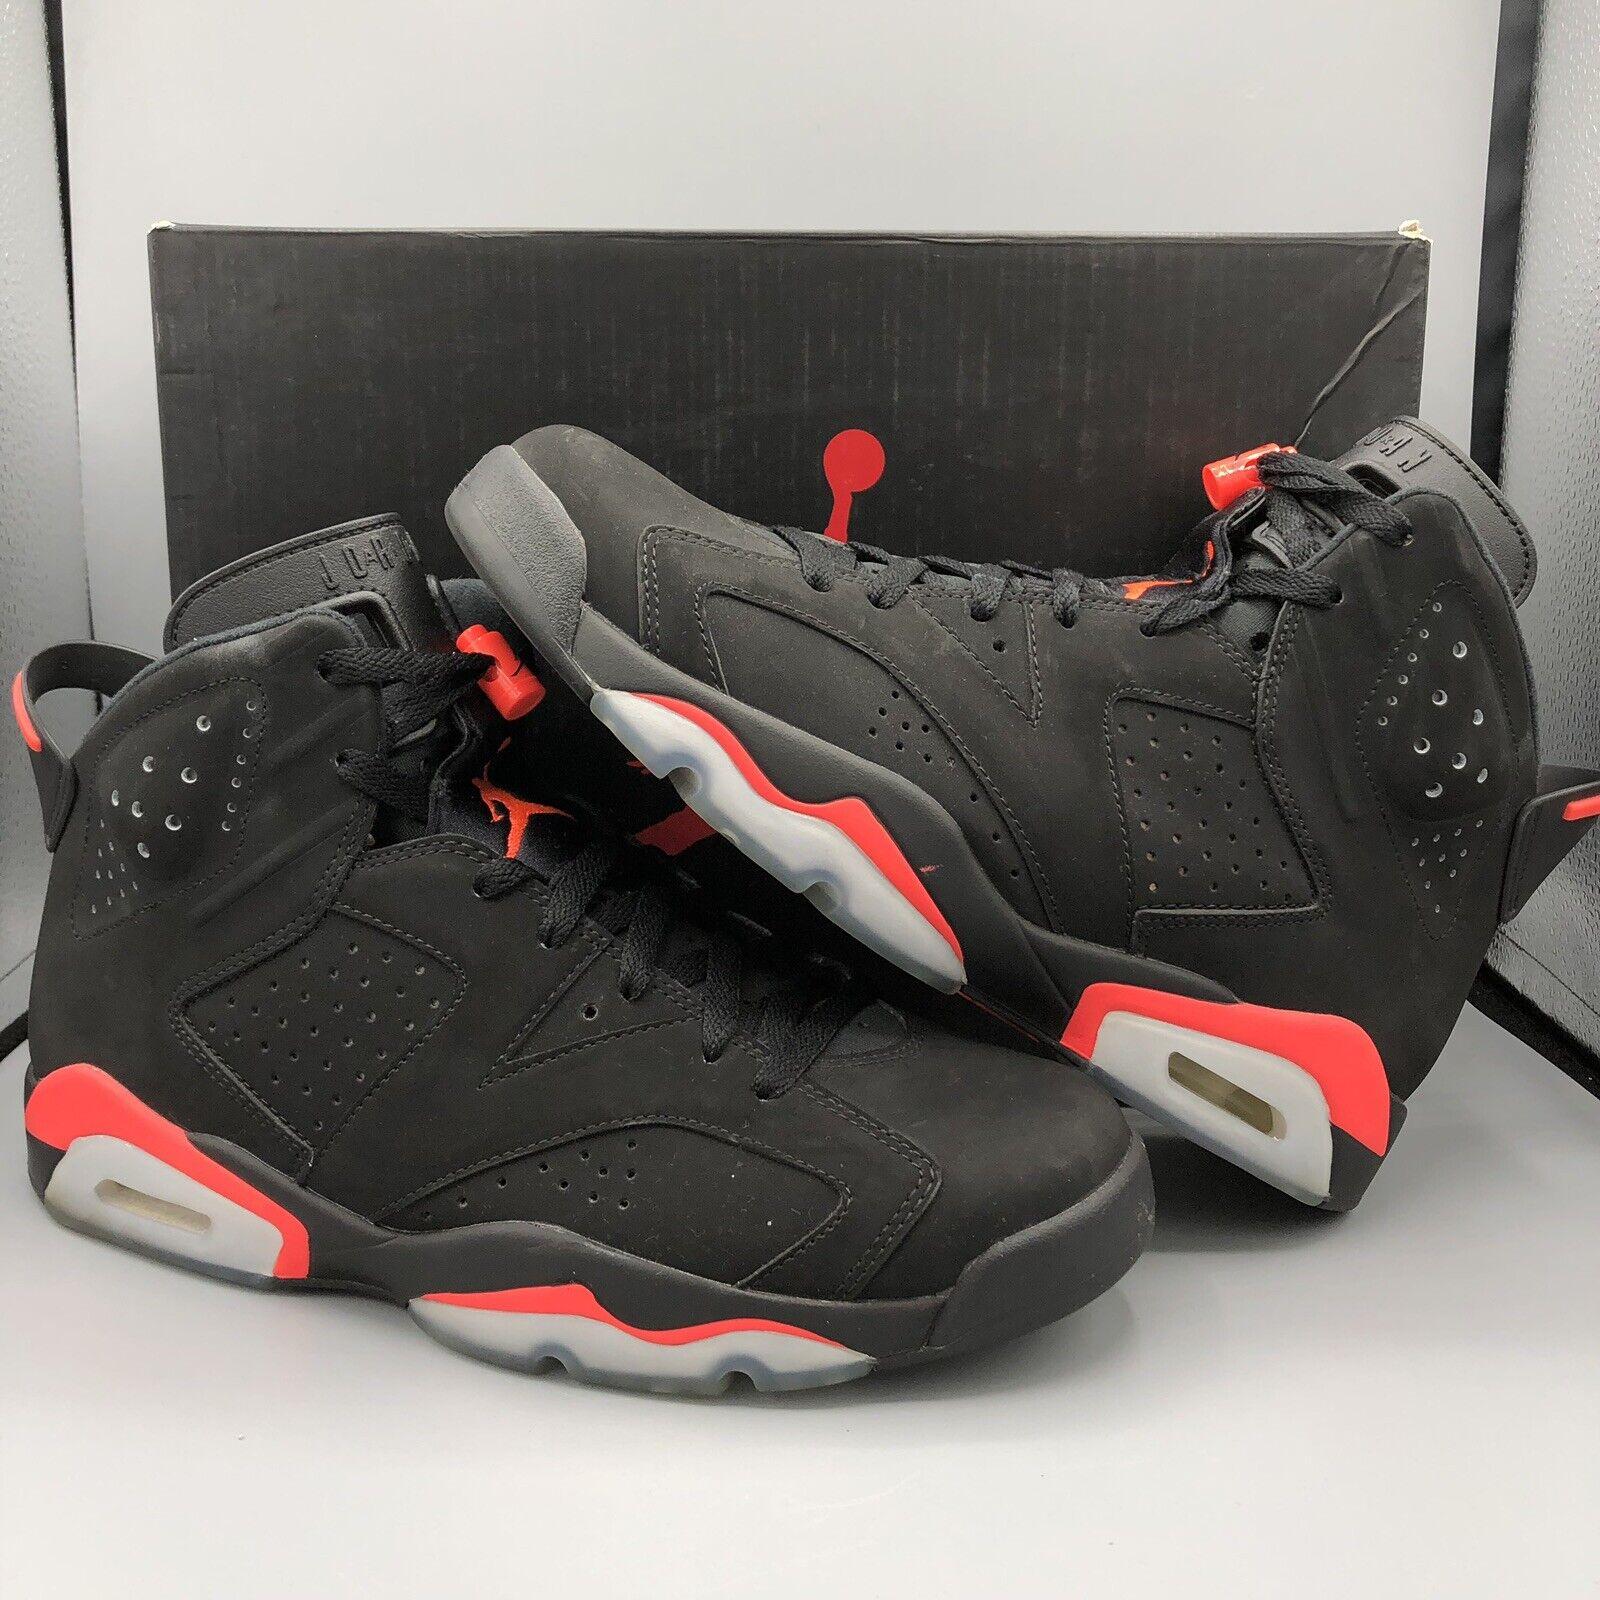 8a8bda0a93c3 Nike Air Jordan Retro Retro Retro VI Black Infrared 384664 023 Size 10  Space Jam XI